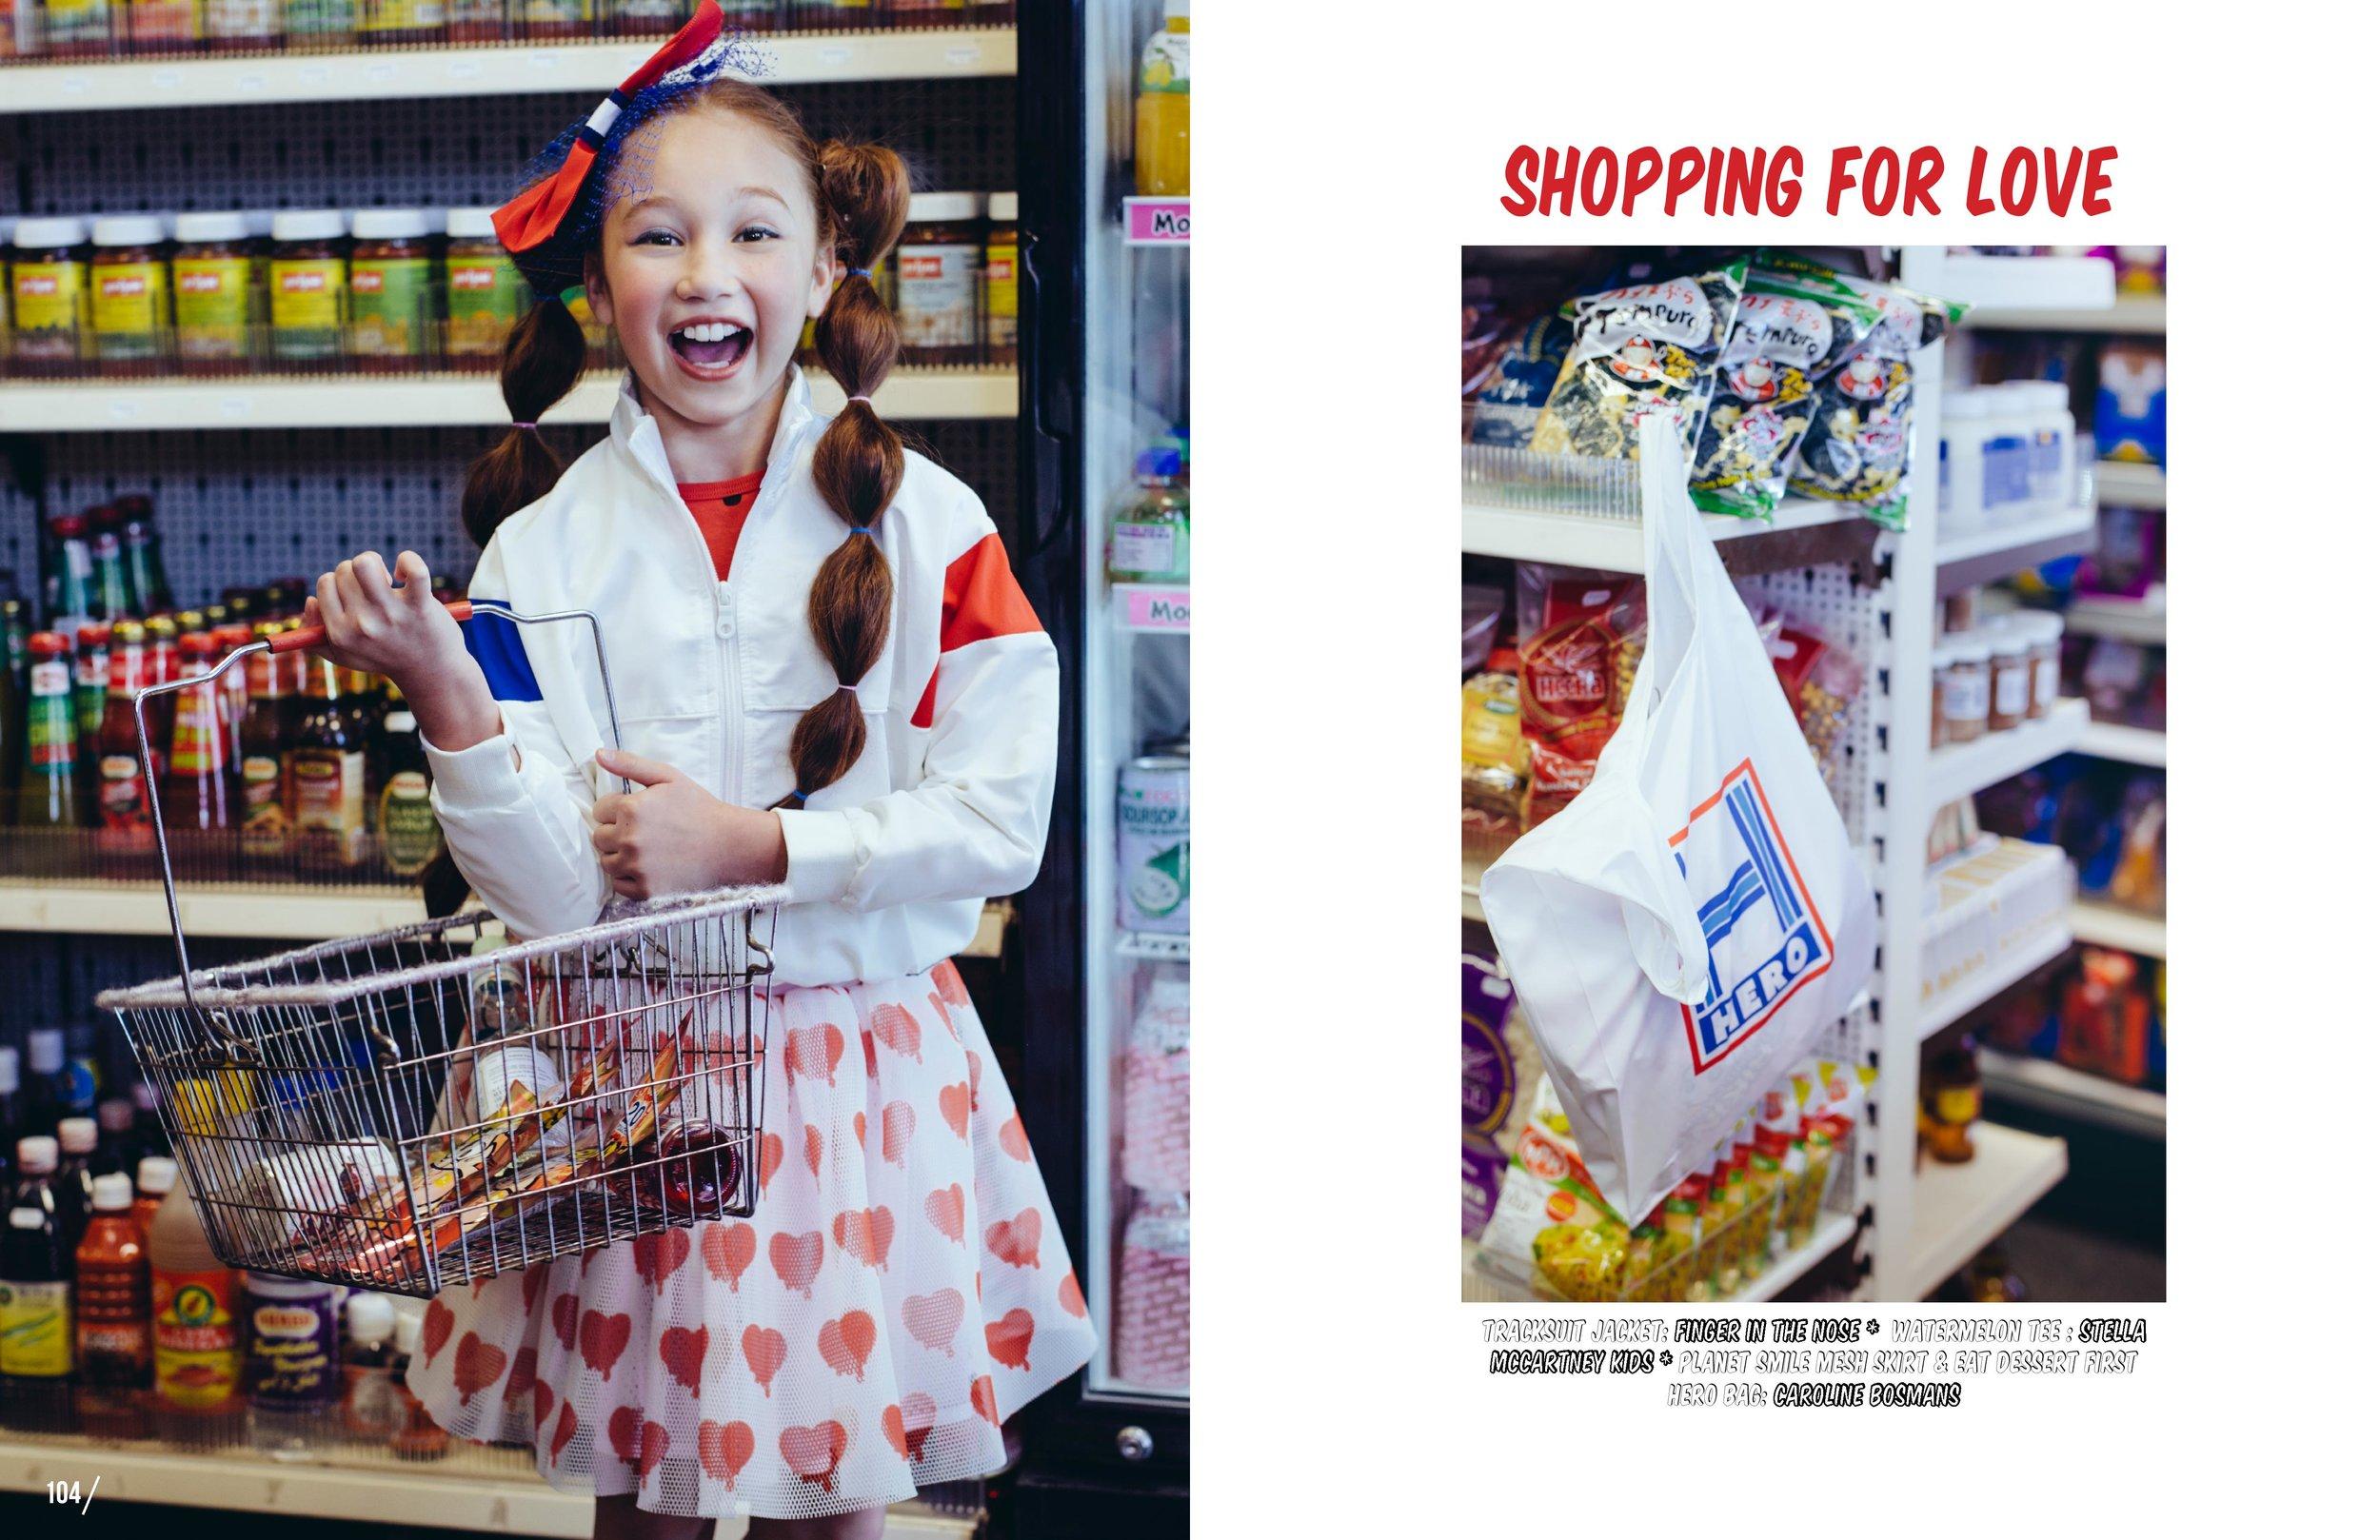 Summer2017-shoppingforlove-page-001.jpg